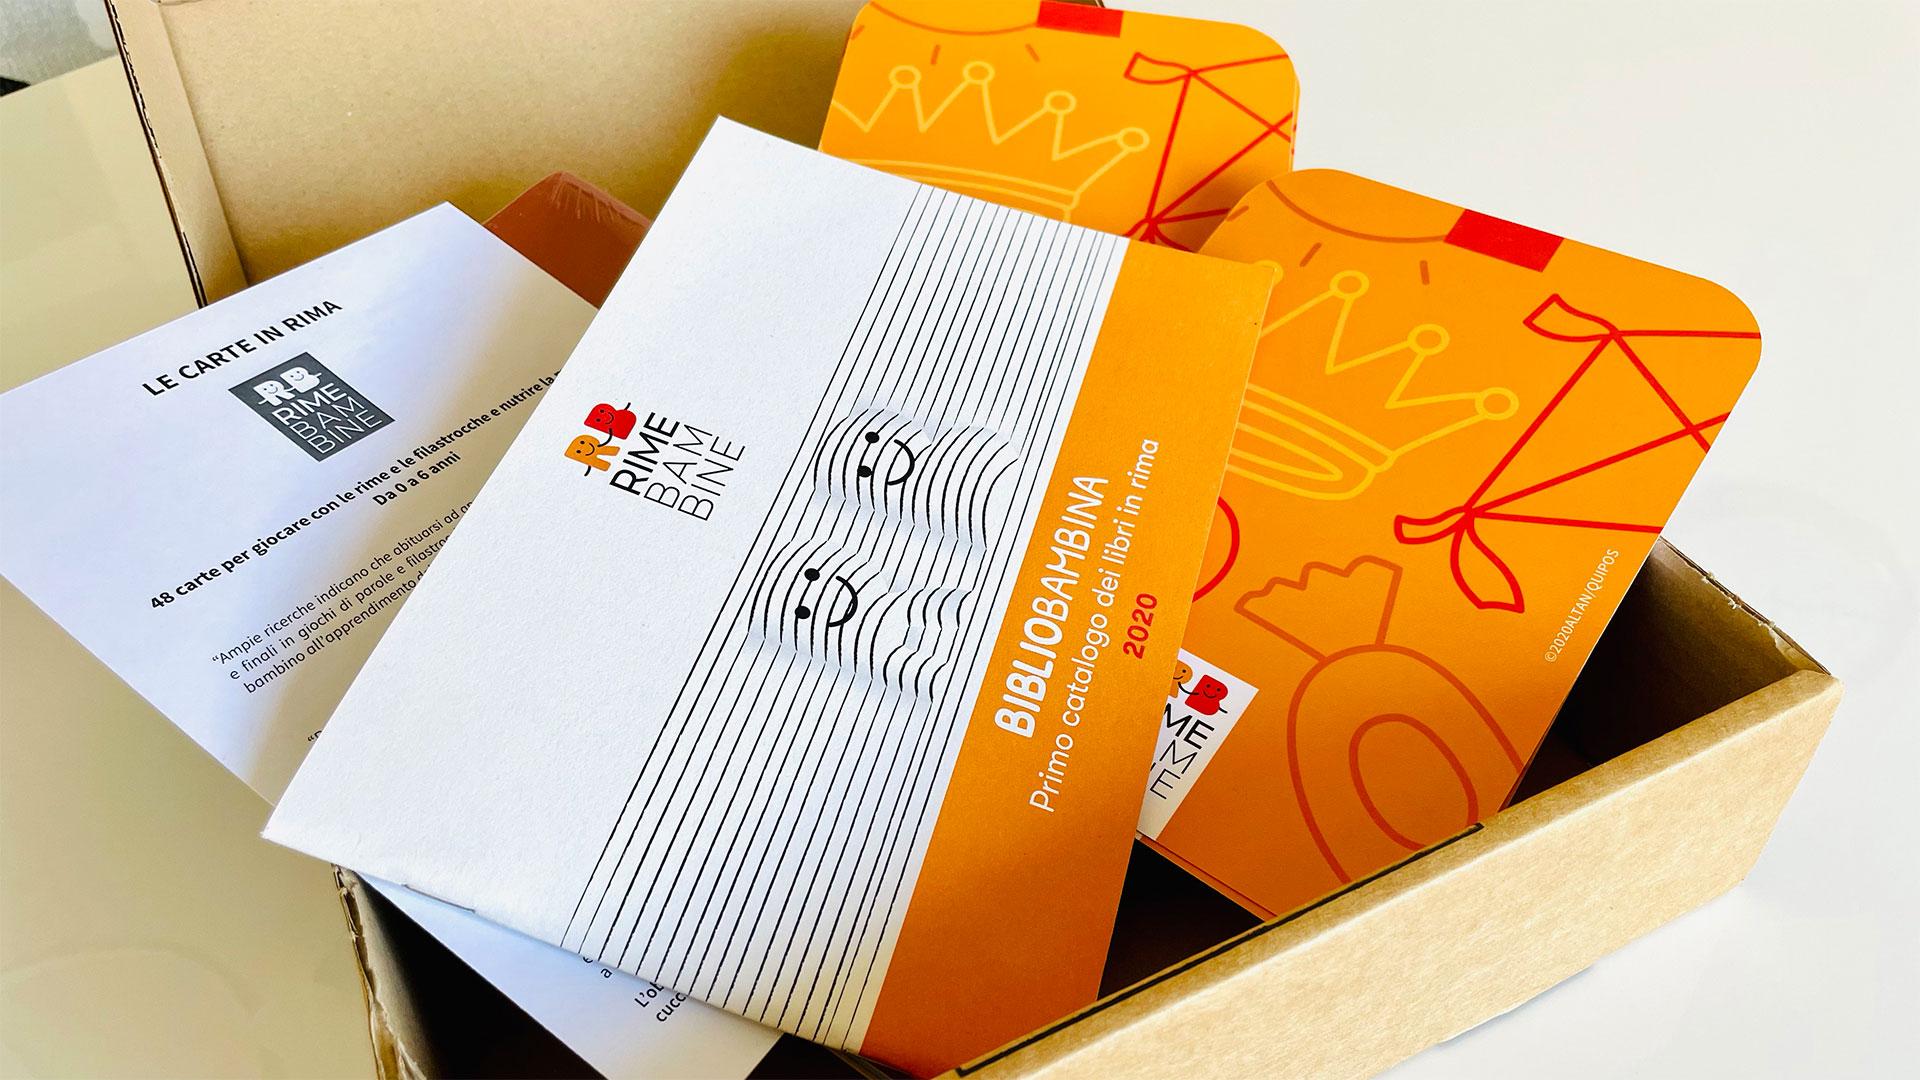 Contenuto scatola Rime Bambine con catalogo e carte gioco bambini